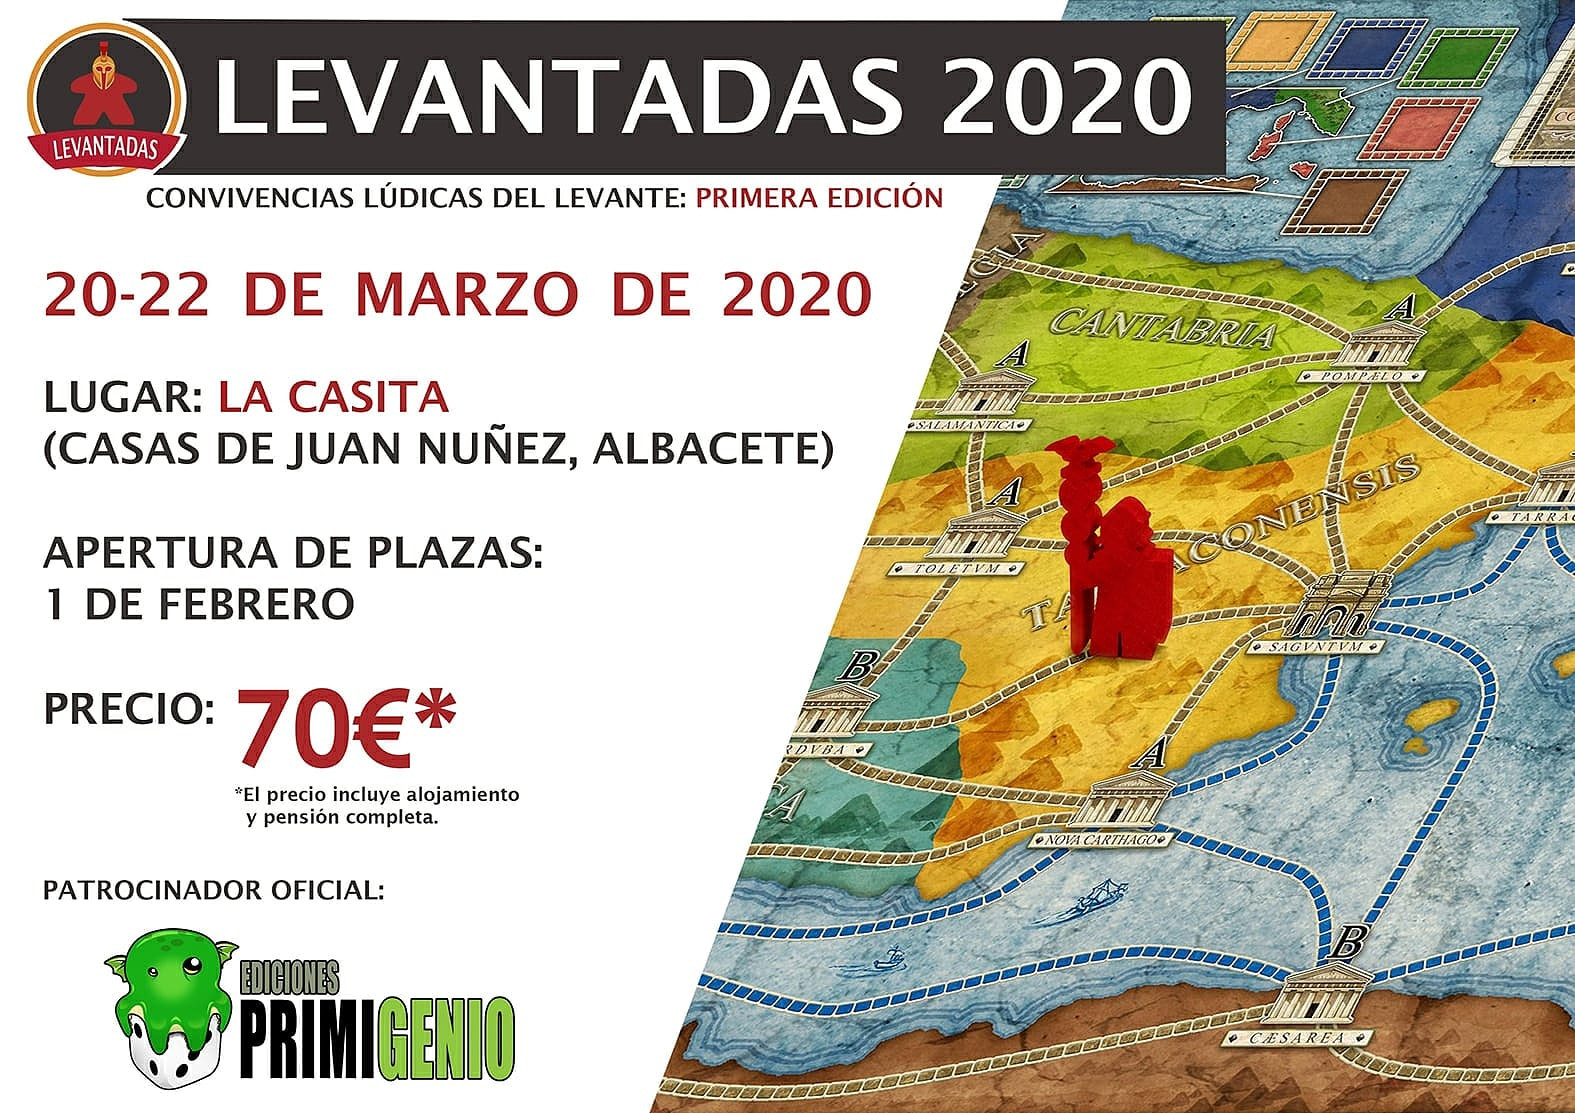 LEVANTADAS 2020